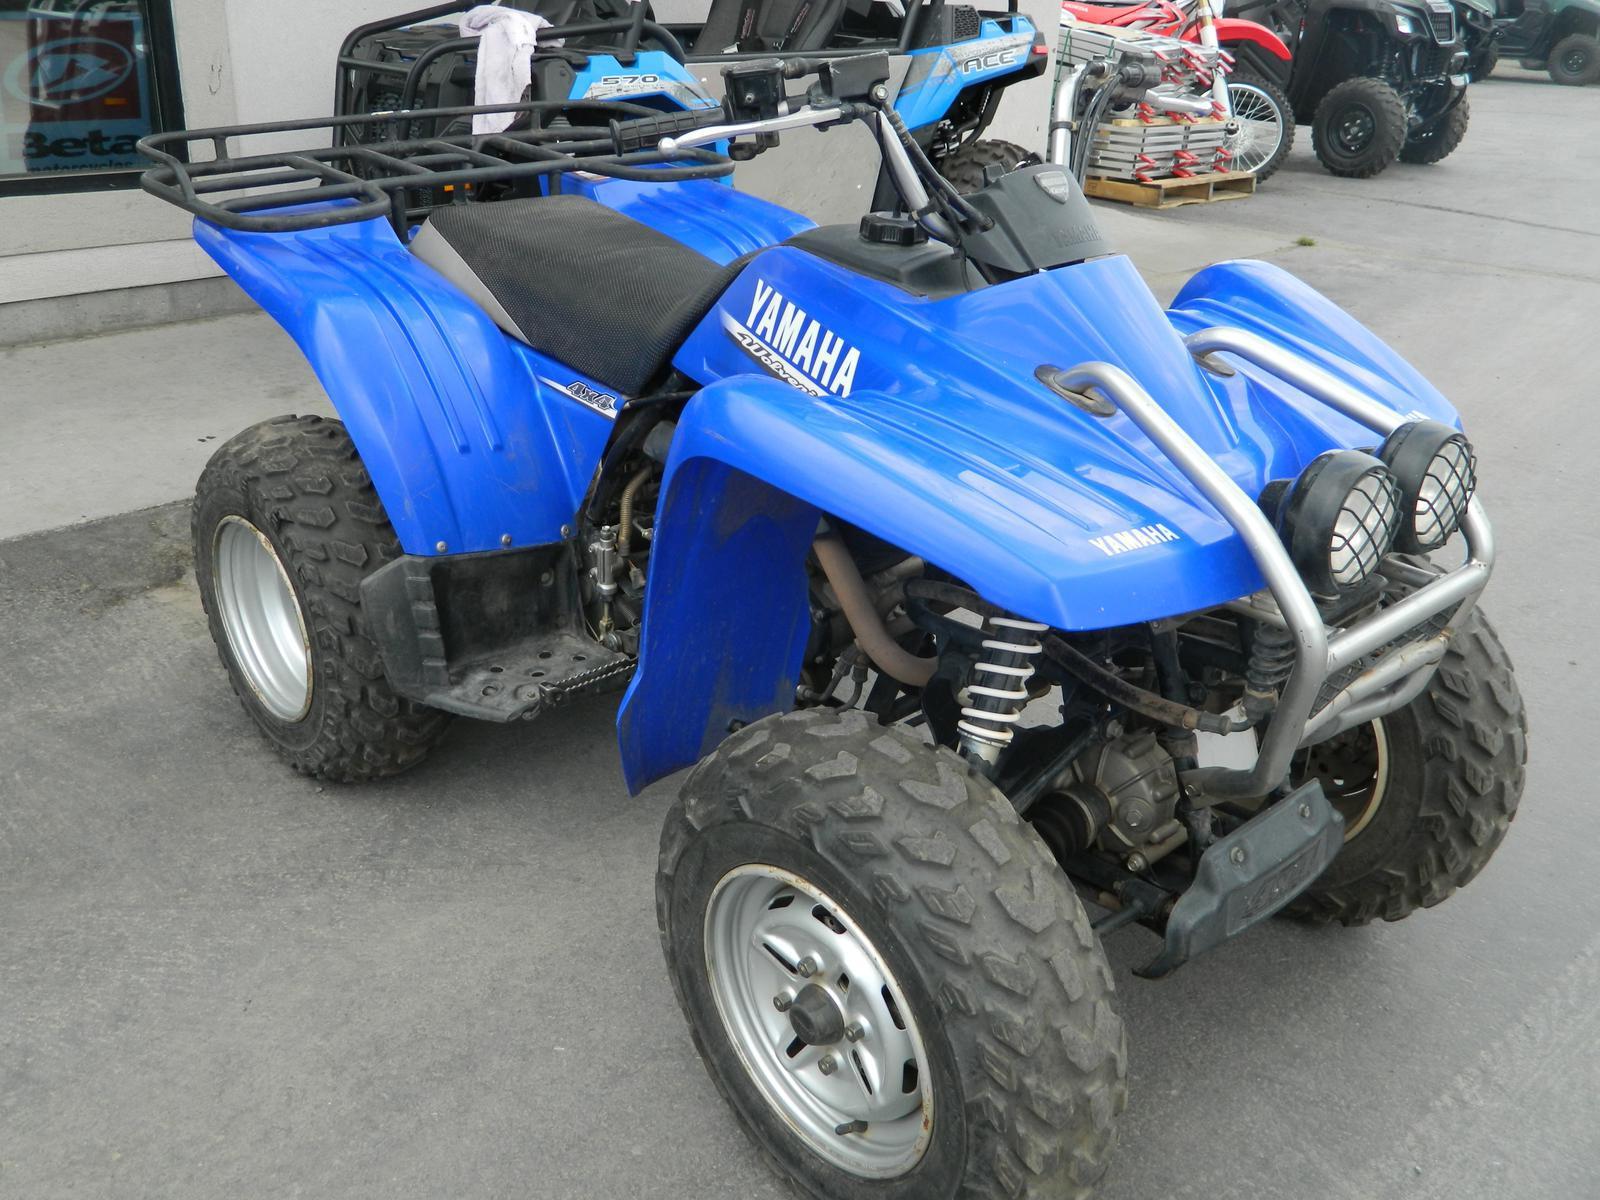 2004 Yamaha WOLVERINE 350